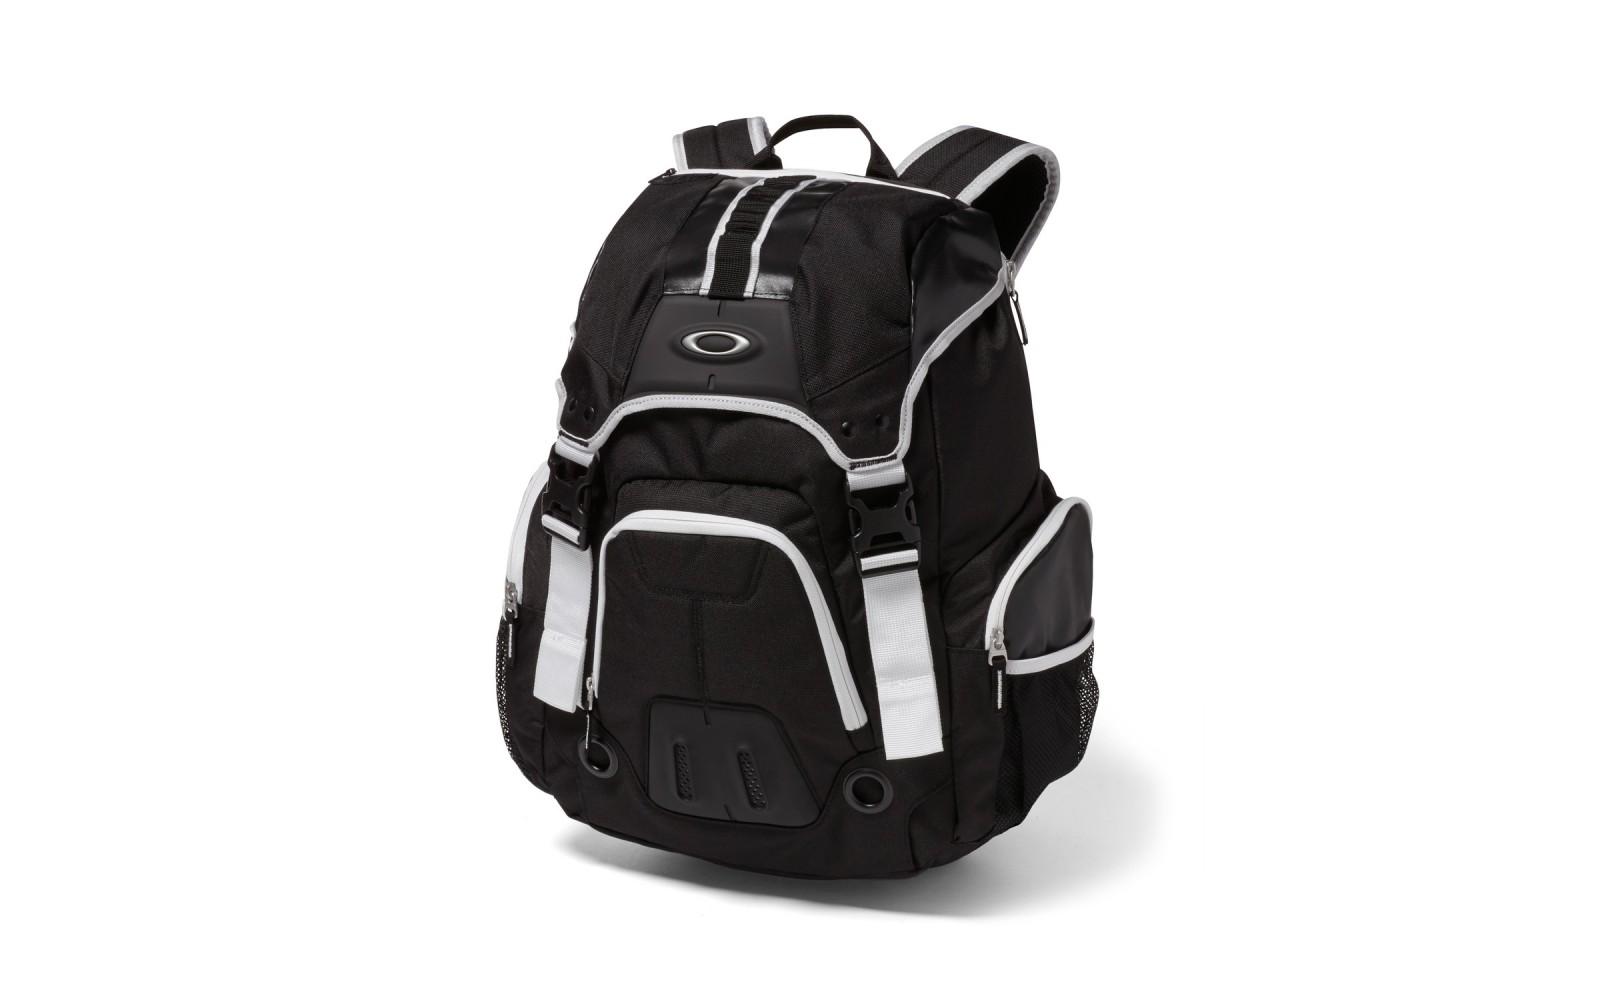 Oakley Gearbox LX Backpack - Black/White - 92908-022 Rugzak